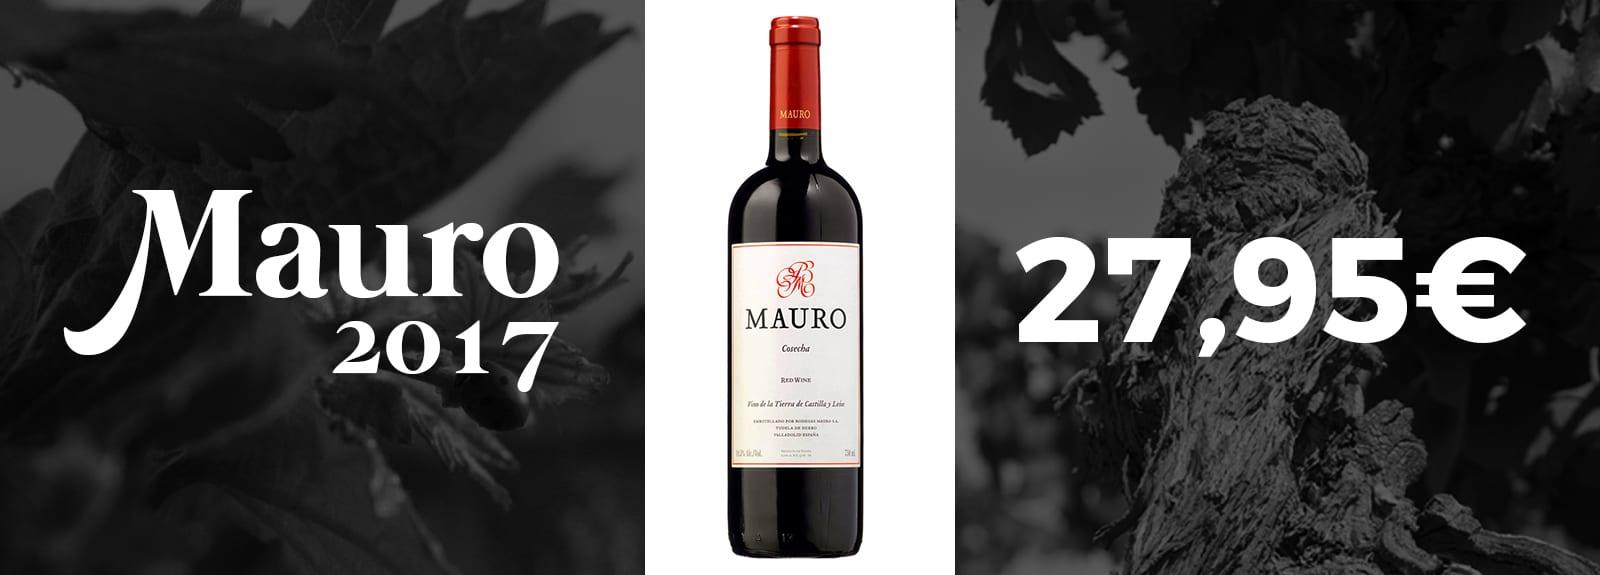 mauro2017